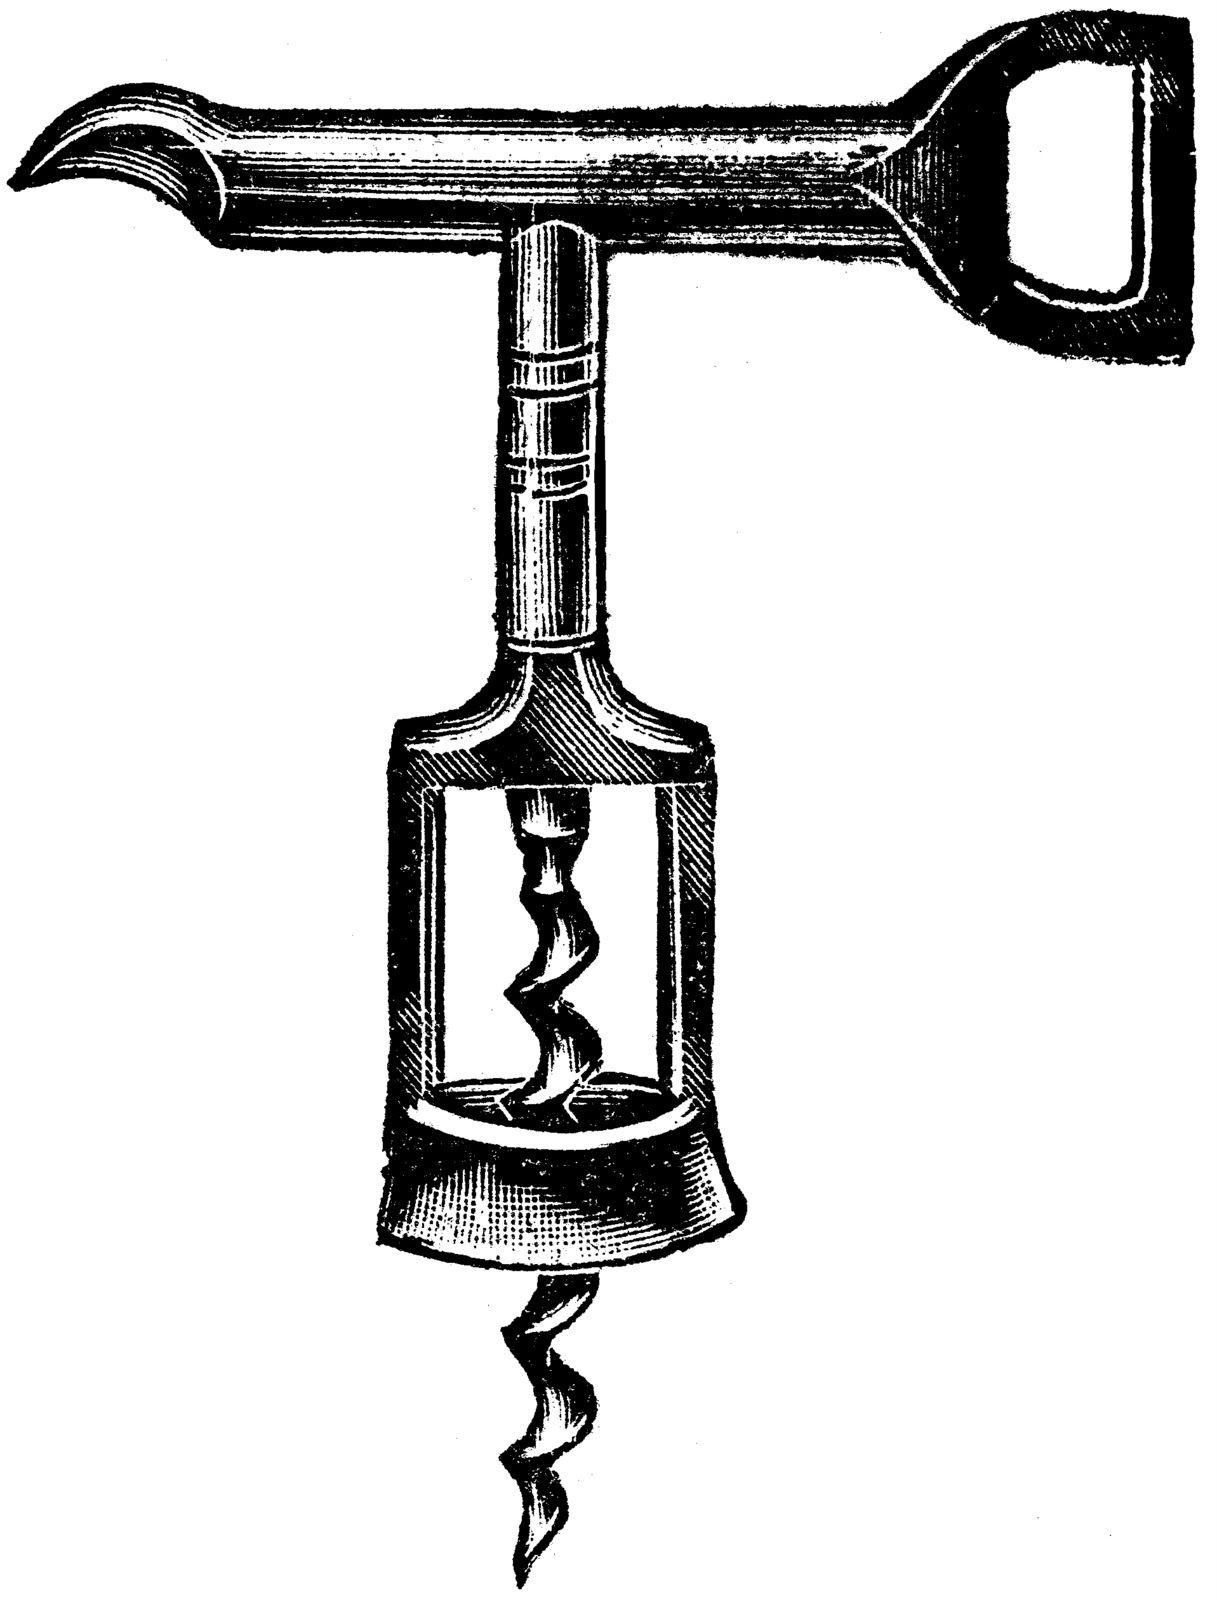 Free Vintage Clip Art Images Vintage Corkscrew Wine Openers Wine Opener Corkscrew Art Wine Art